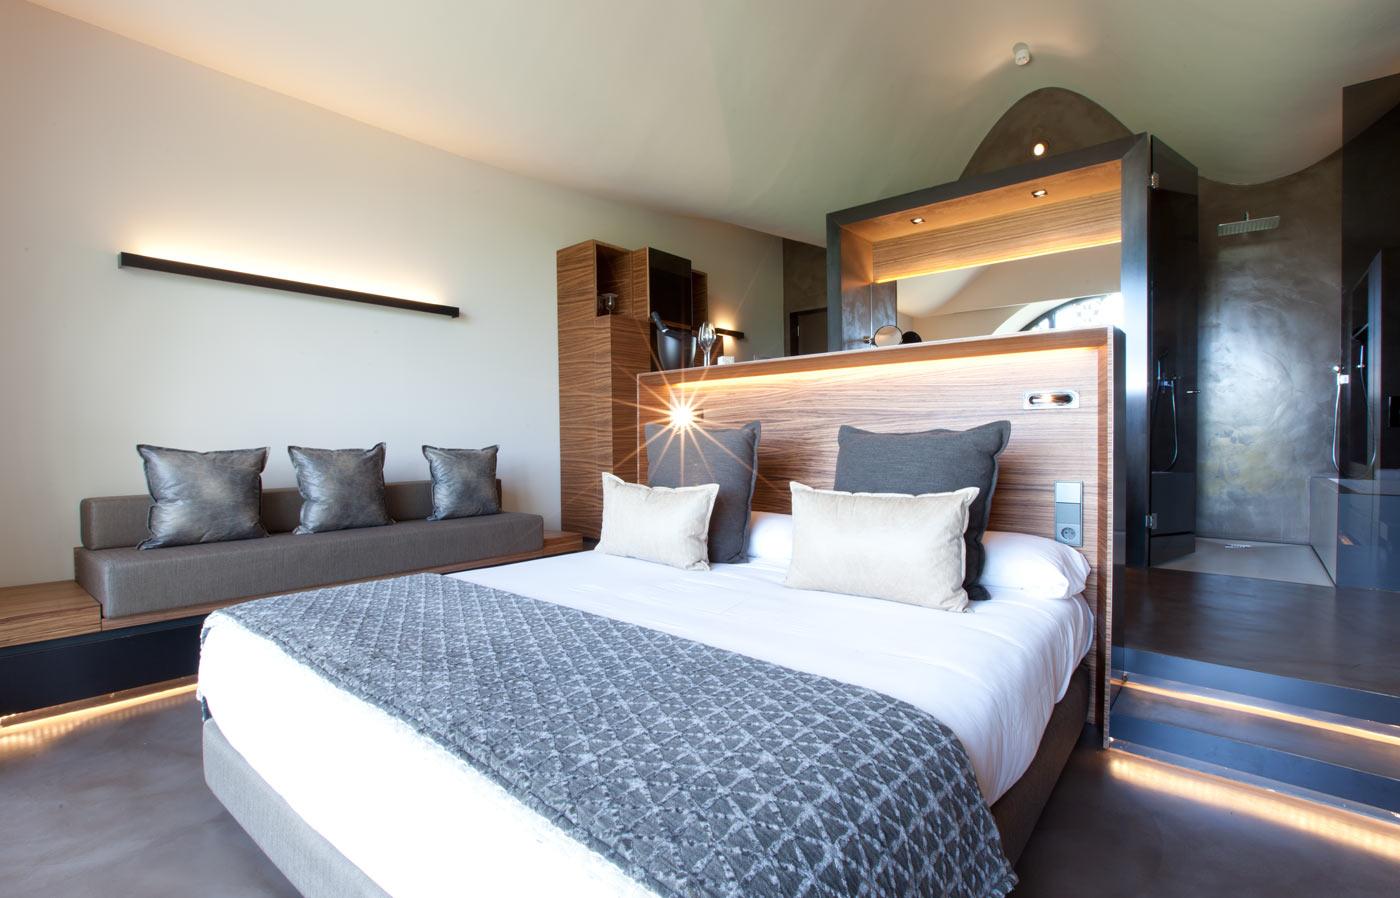 Fotos del hotel - HOTEL DOMUS SELECTA CAVA AND HOTEL MASTINELL